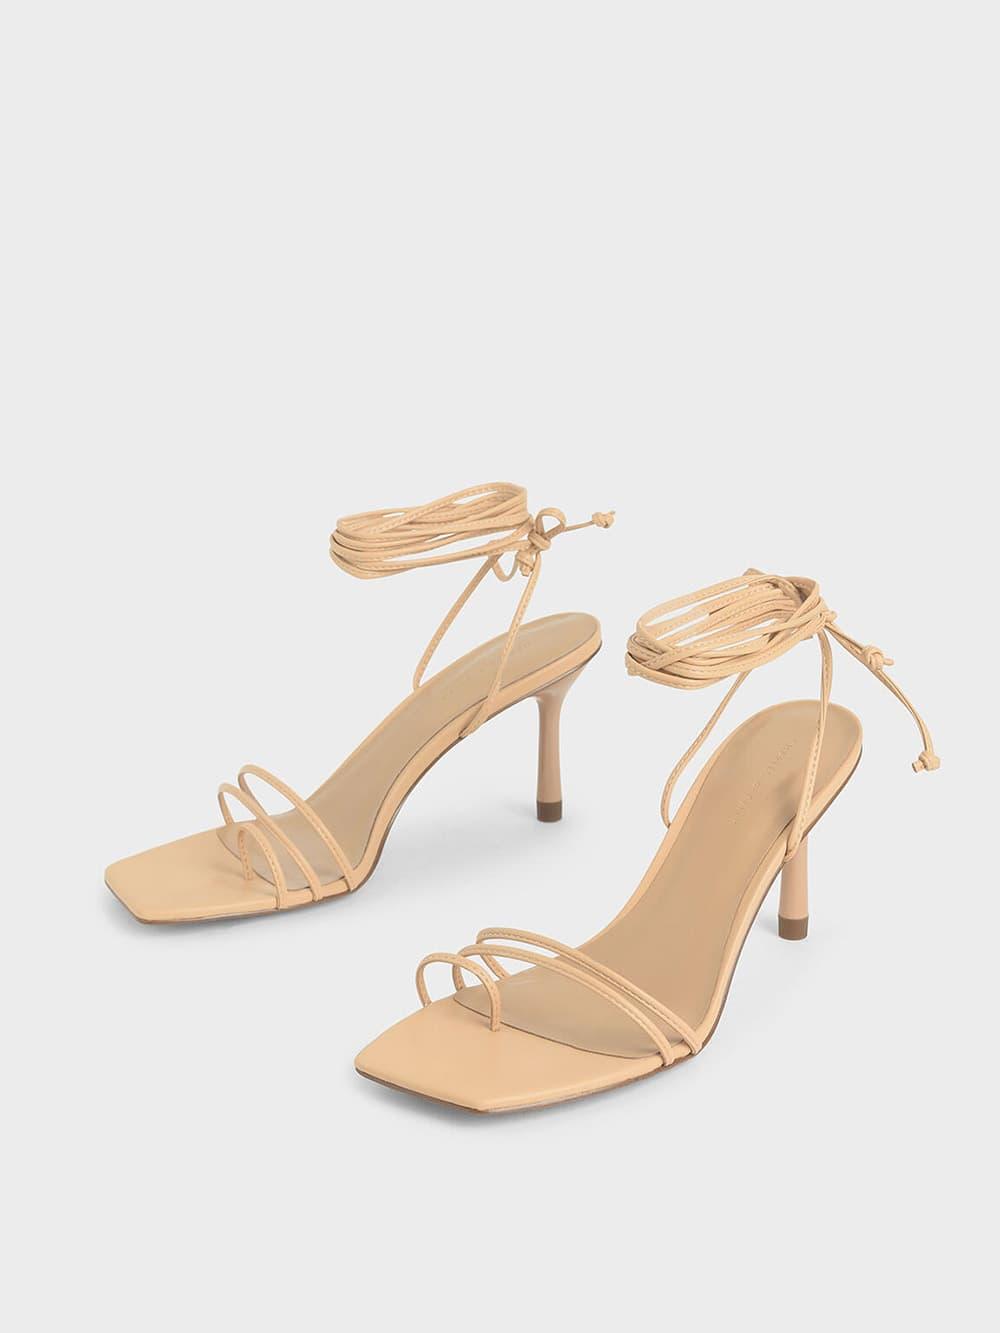 Ghazzi Womens Slippers Summer Flowers Home Beach Shoes Ladies Sandals Flip Flops Slippers